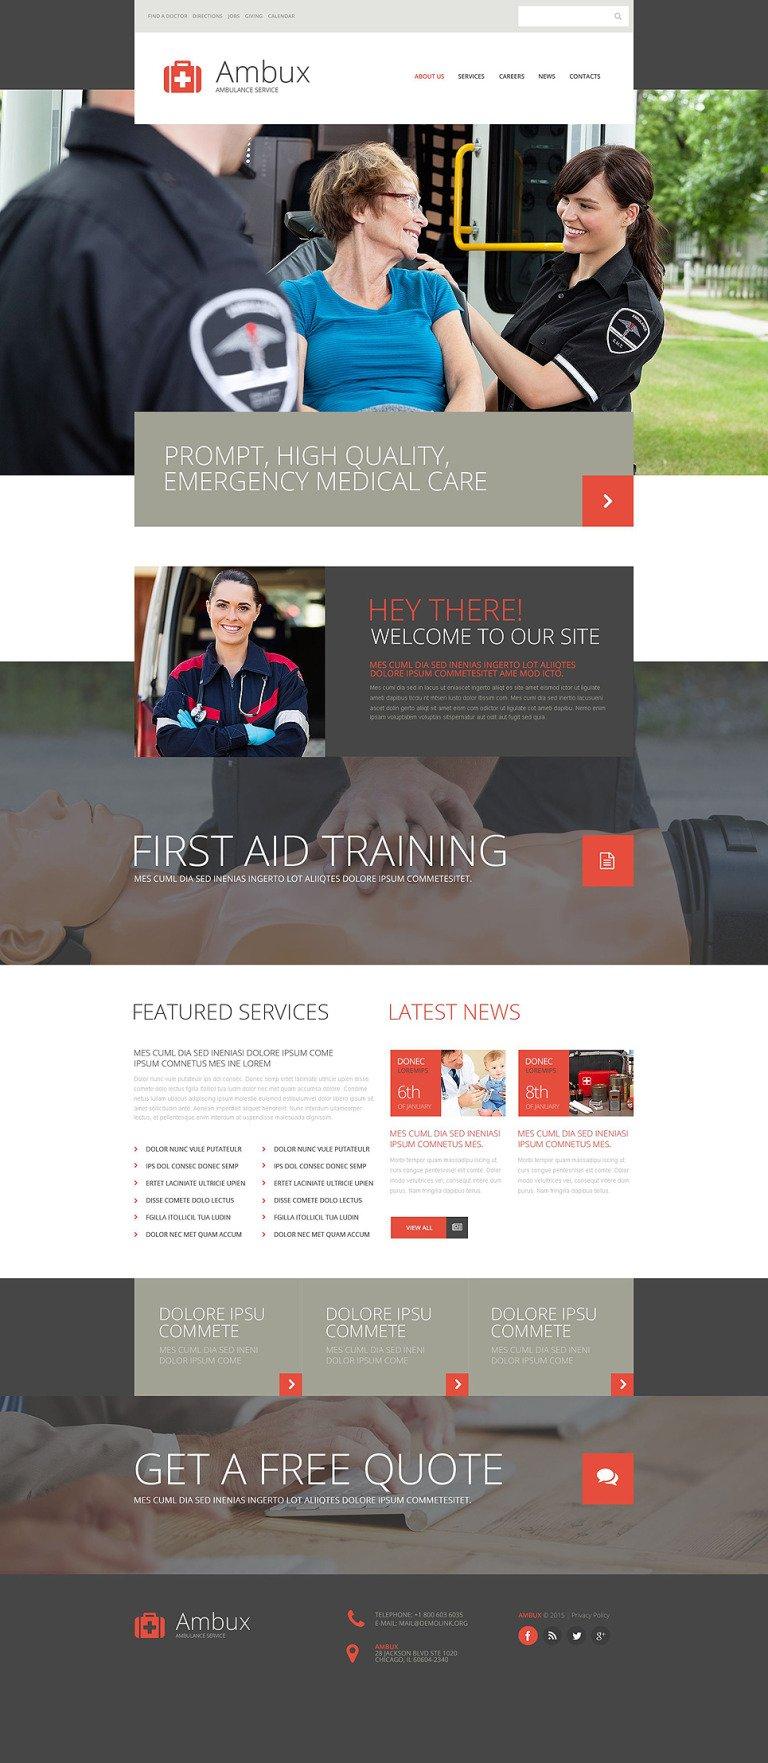 Ambulance Services Website Template New Screenshots BIG